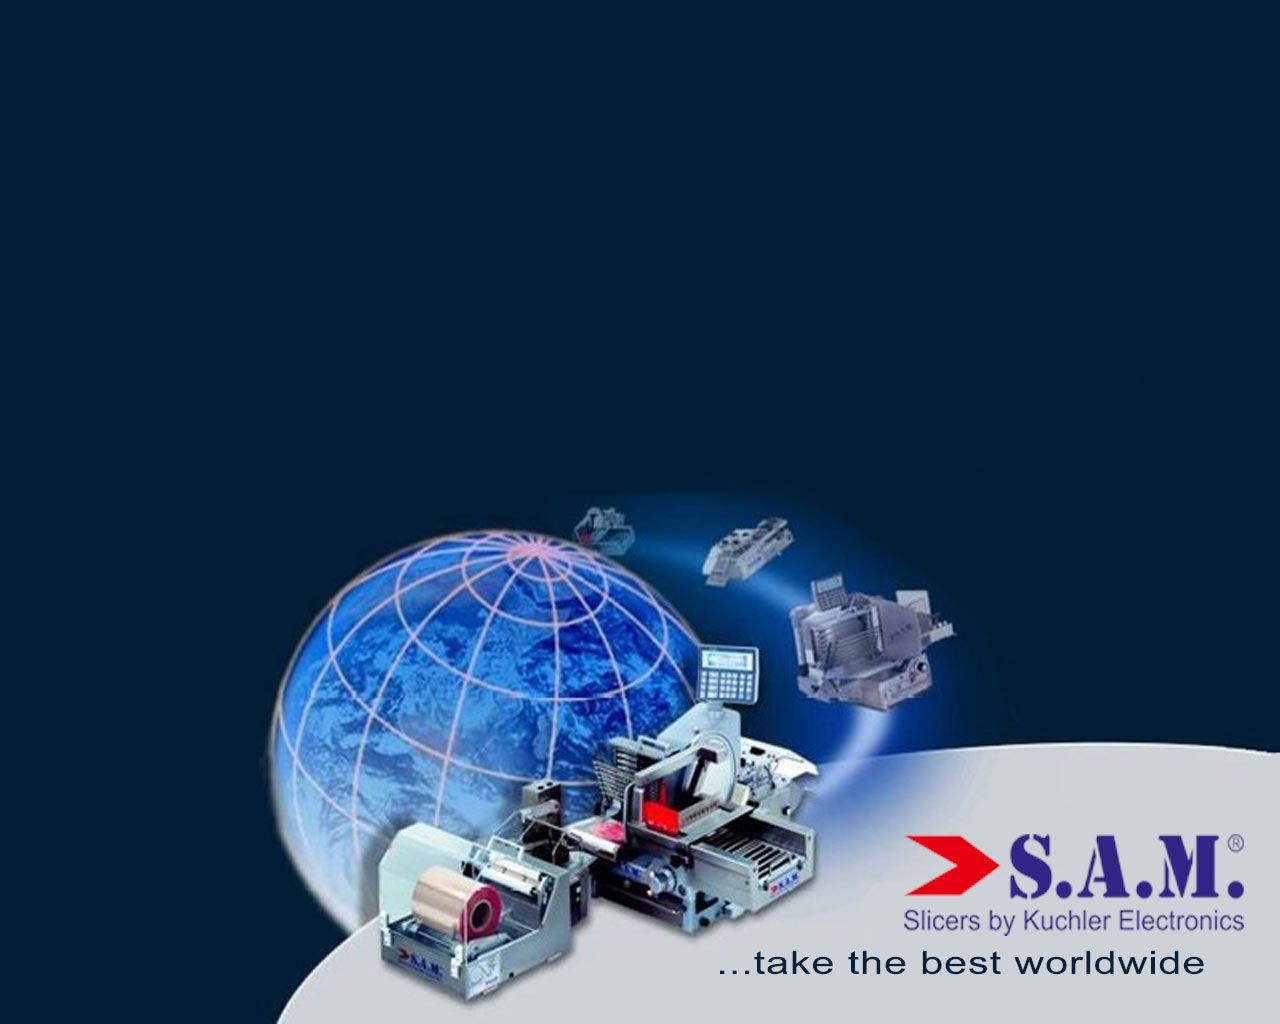 Sam World S A M Kuchler Electronics Gmbh